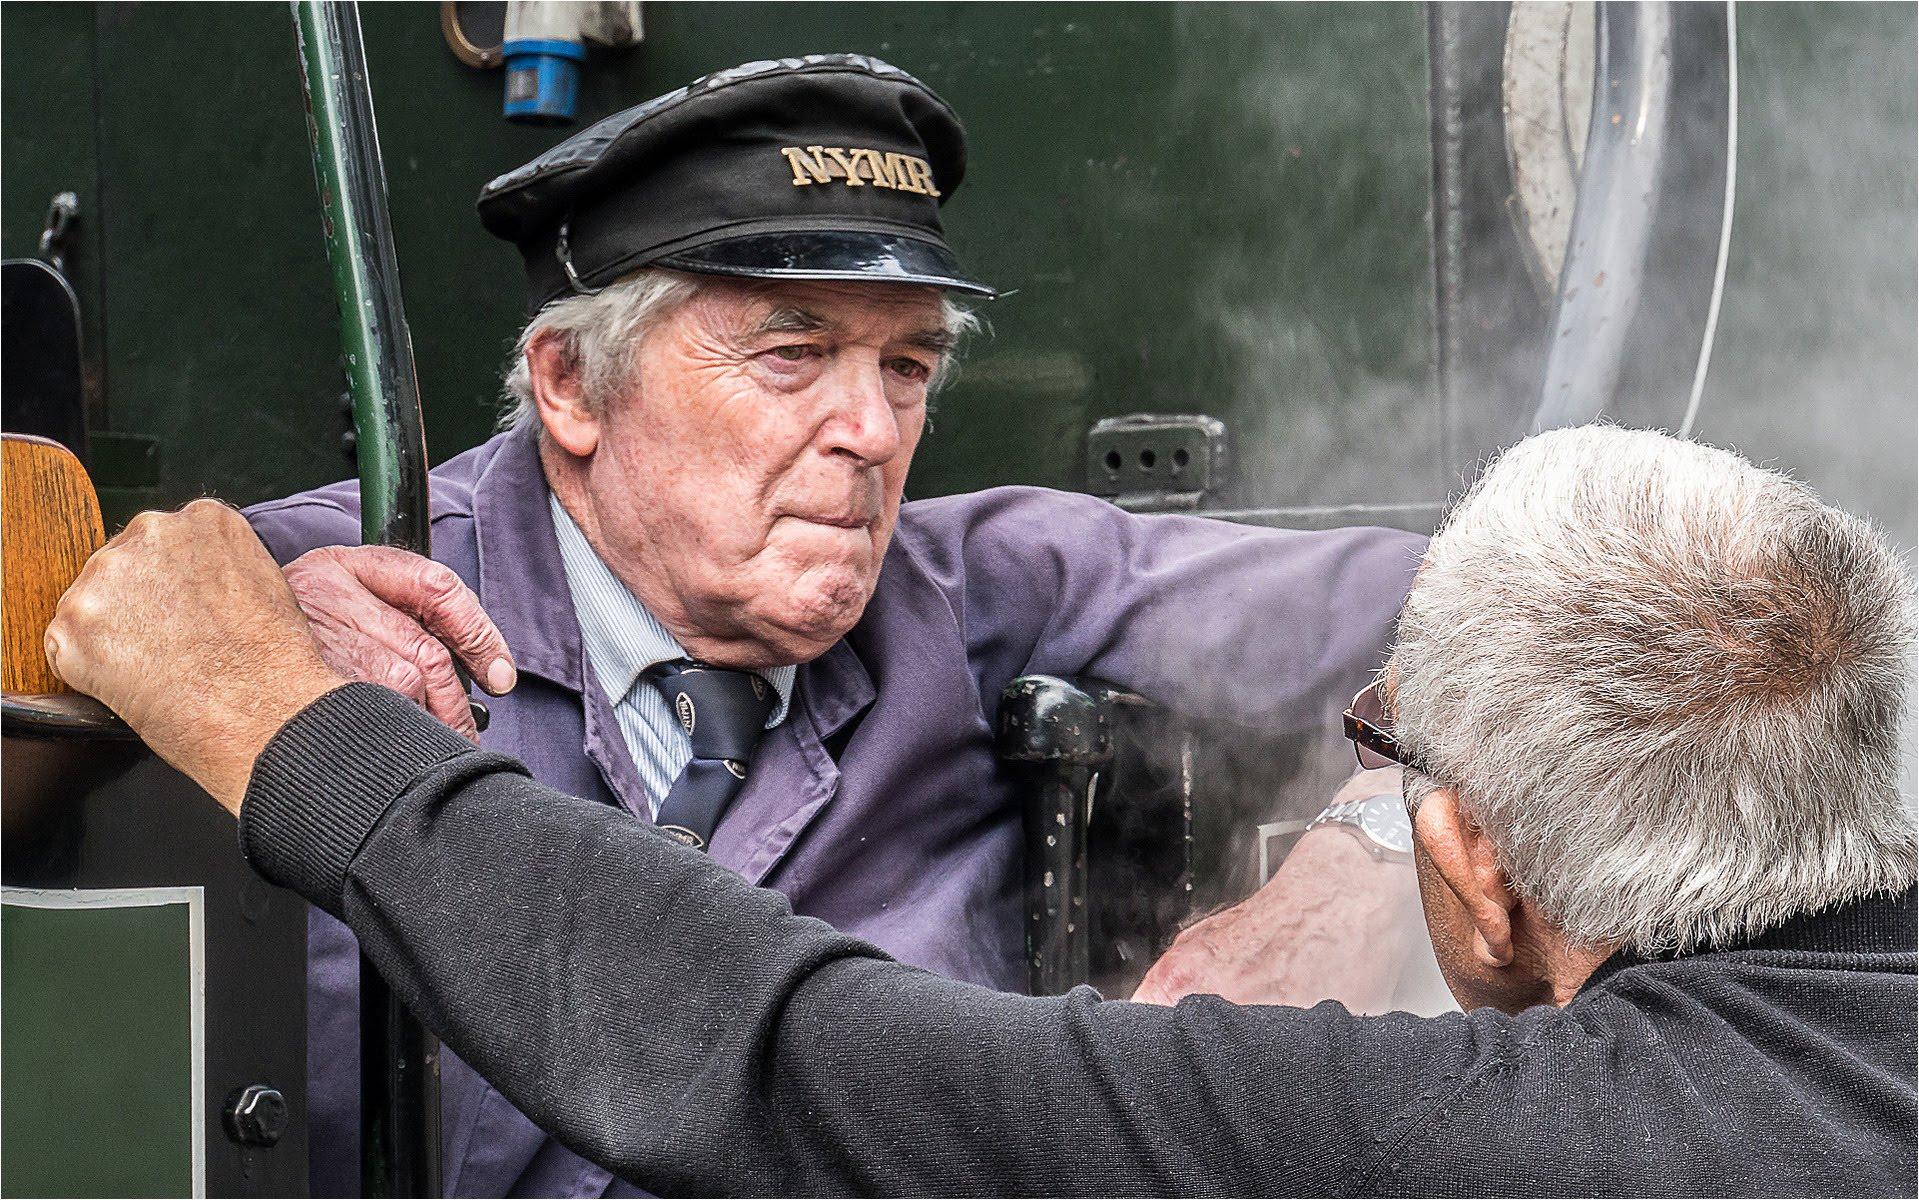 Intense Discussion Pickering Railway UK.jpg